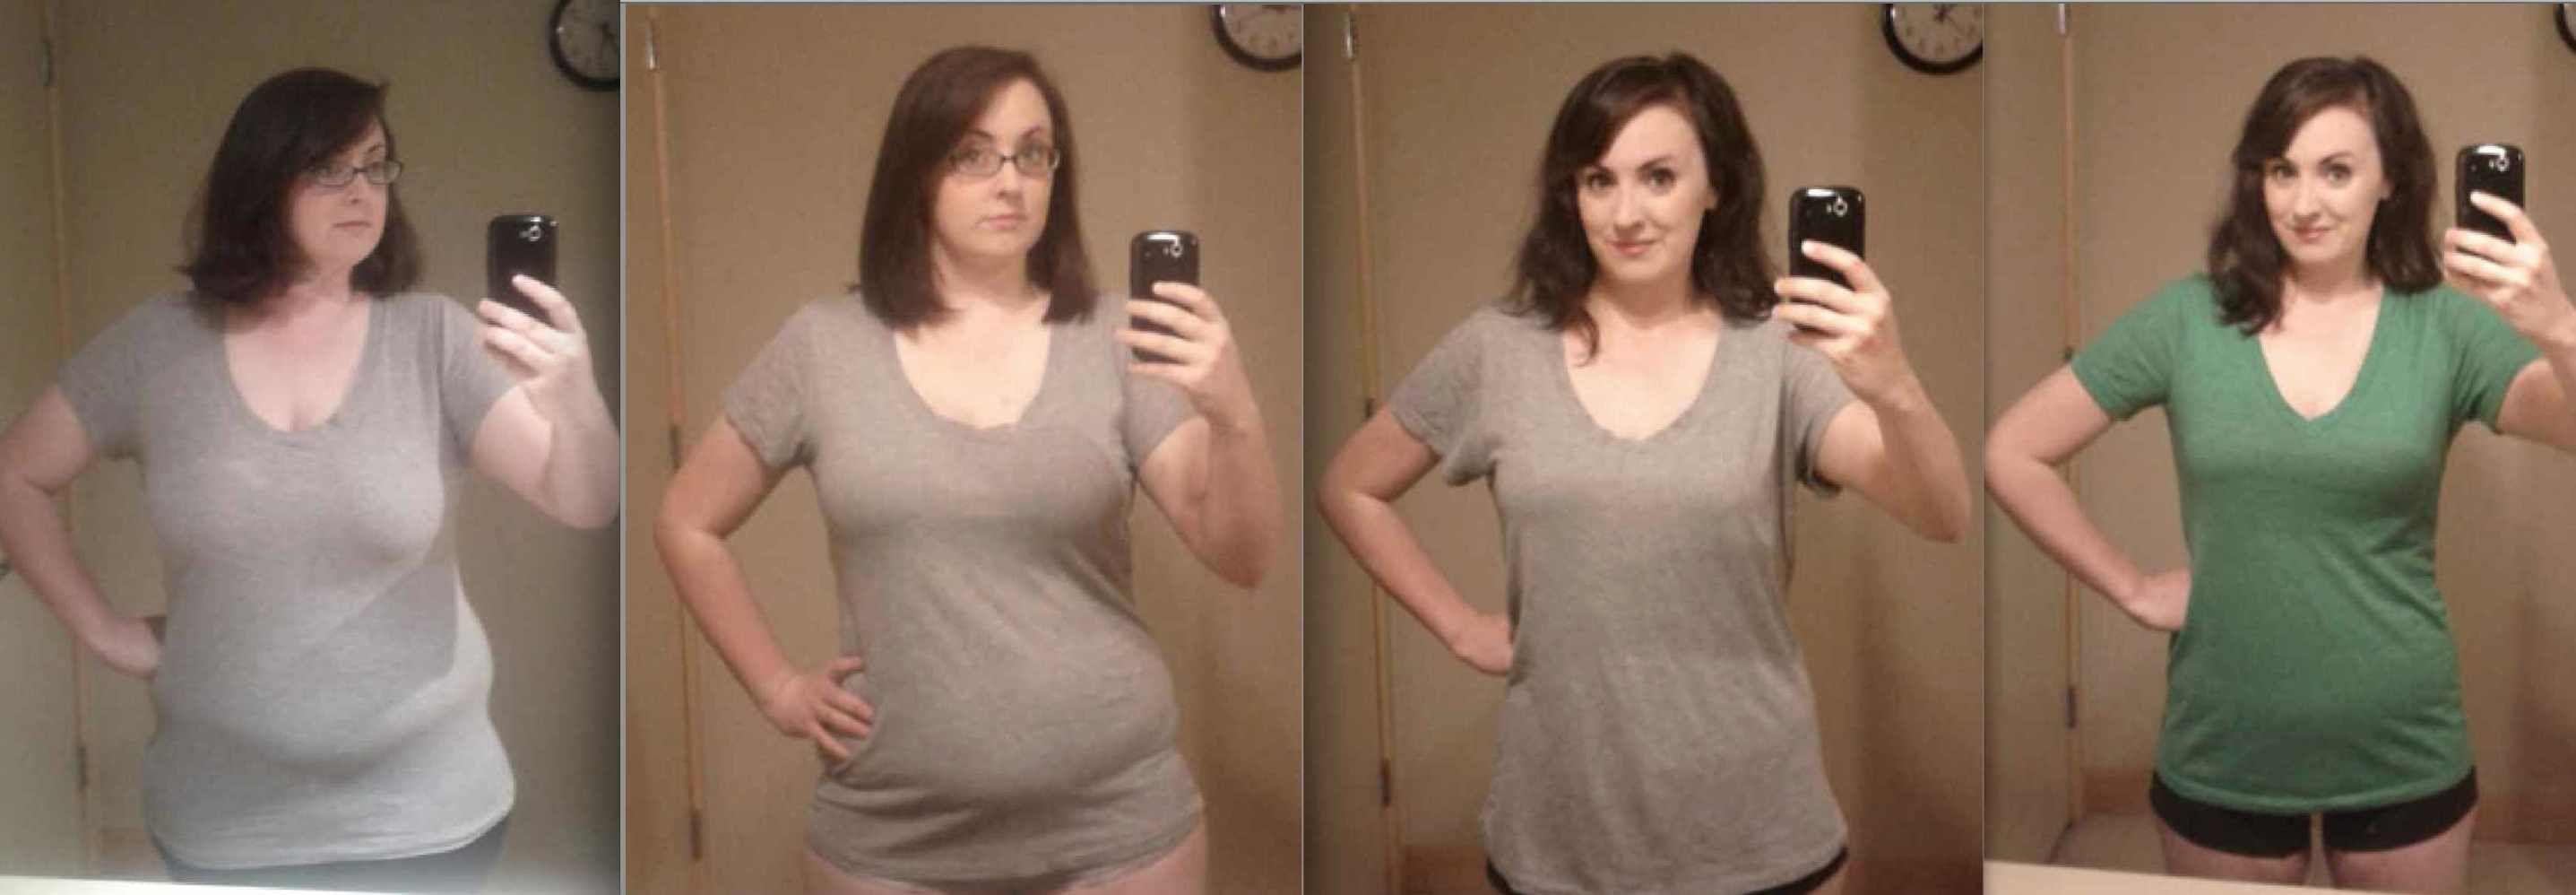 Almost jake galifianakis weight loss very